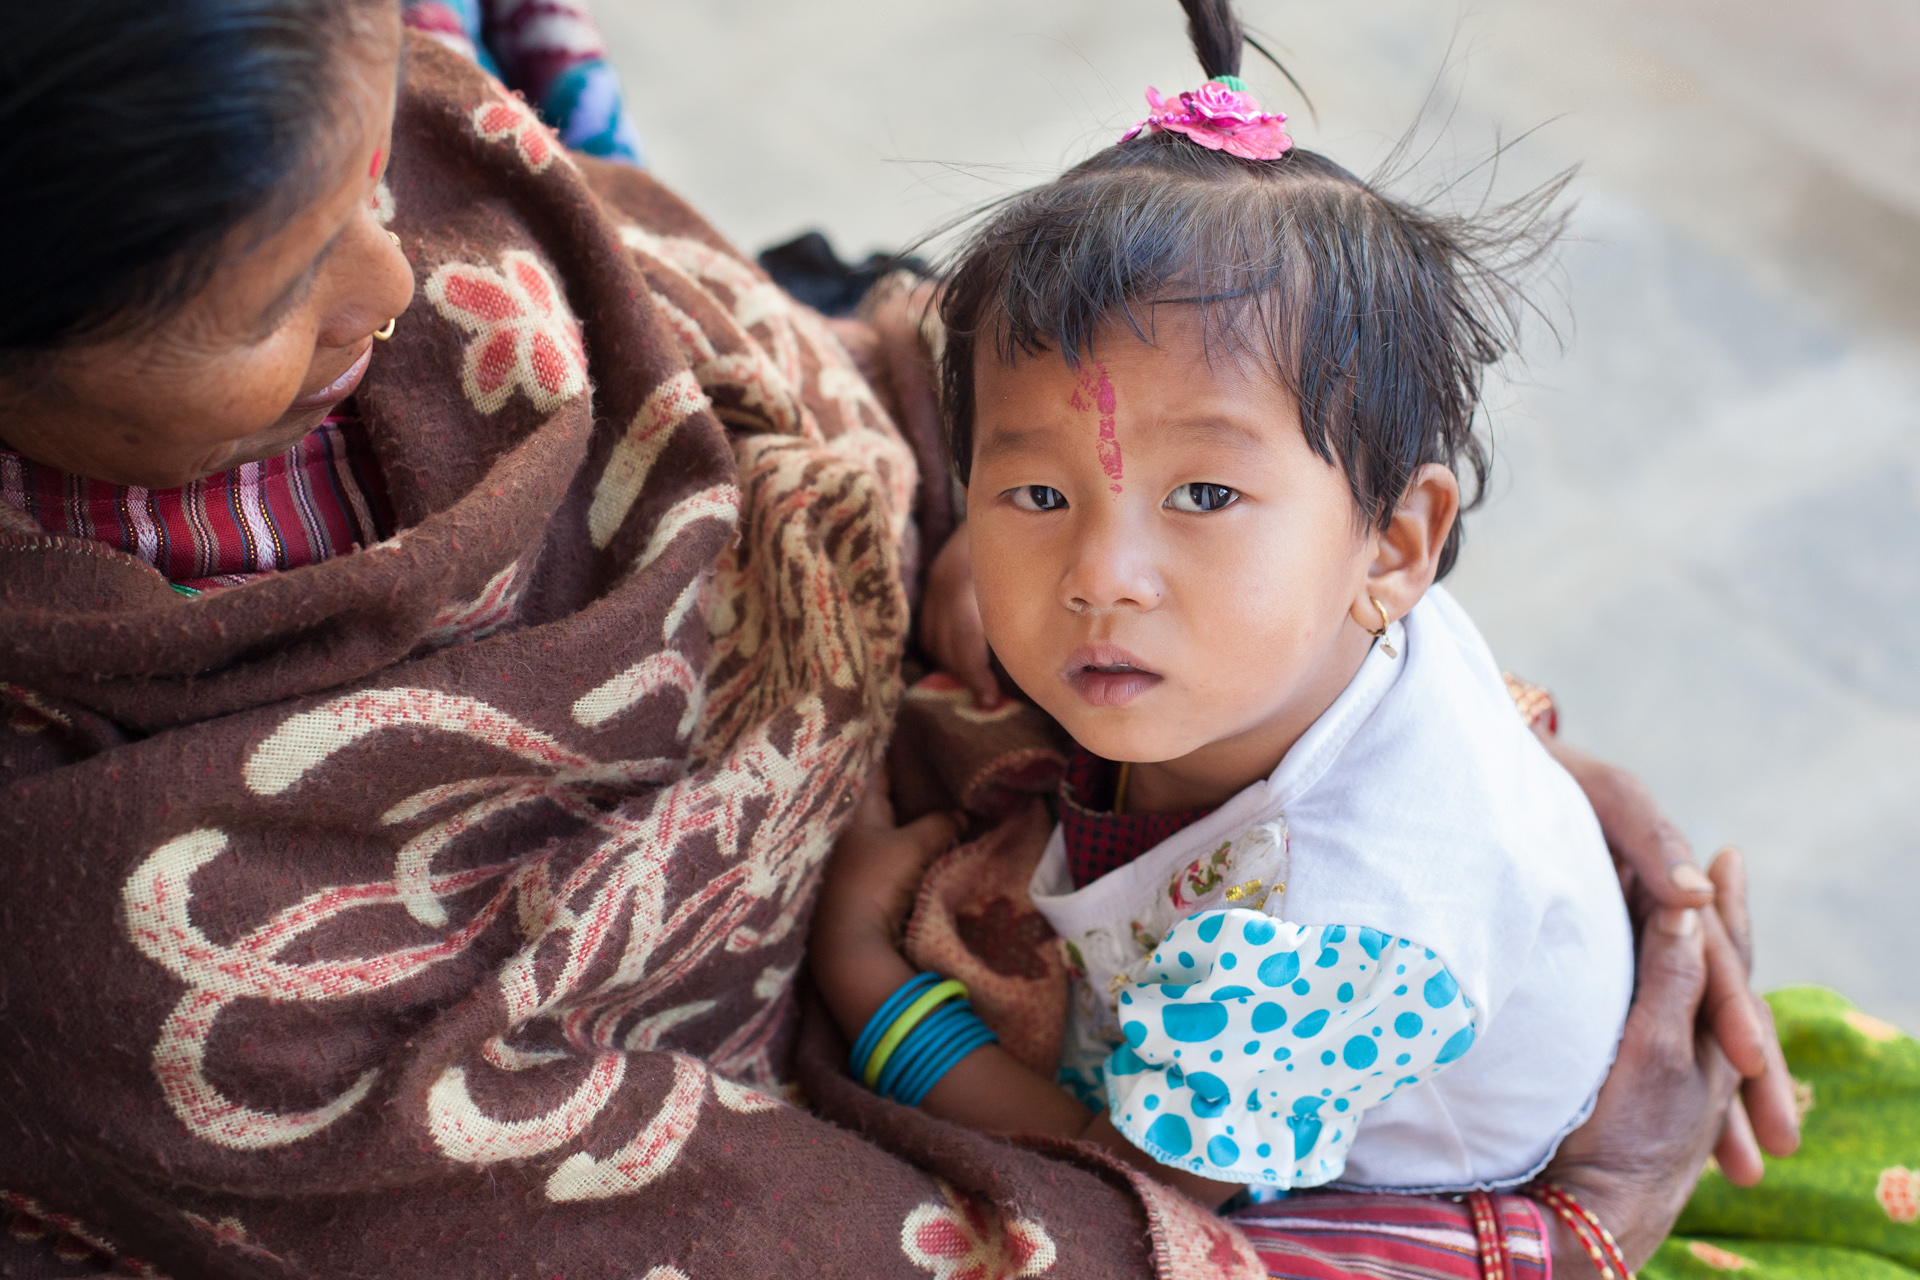 Humanitarian-Acupuncture-Mindful-Medicine-Nepal-Namo-buddha-Jason-Bax-02.JPG